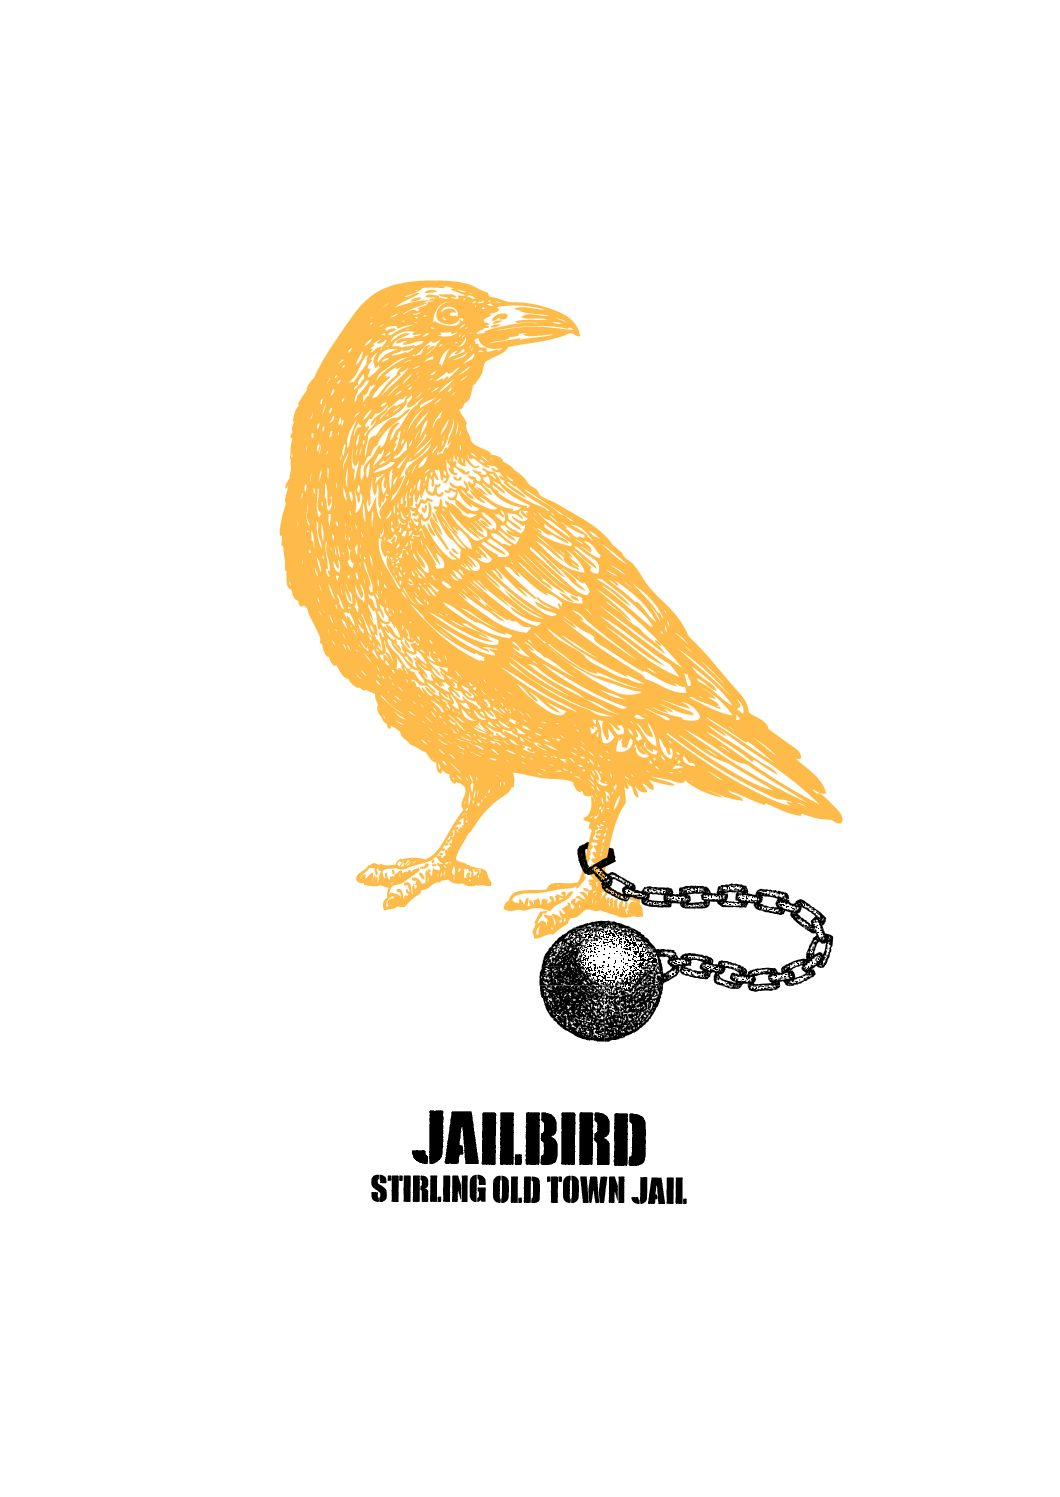 https://oldtownjail.co.uk/wp-content/uploads/2021/03/Jailbird-tee-pdf.jpg